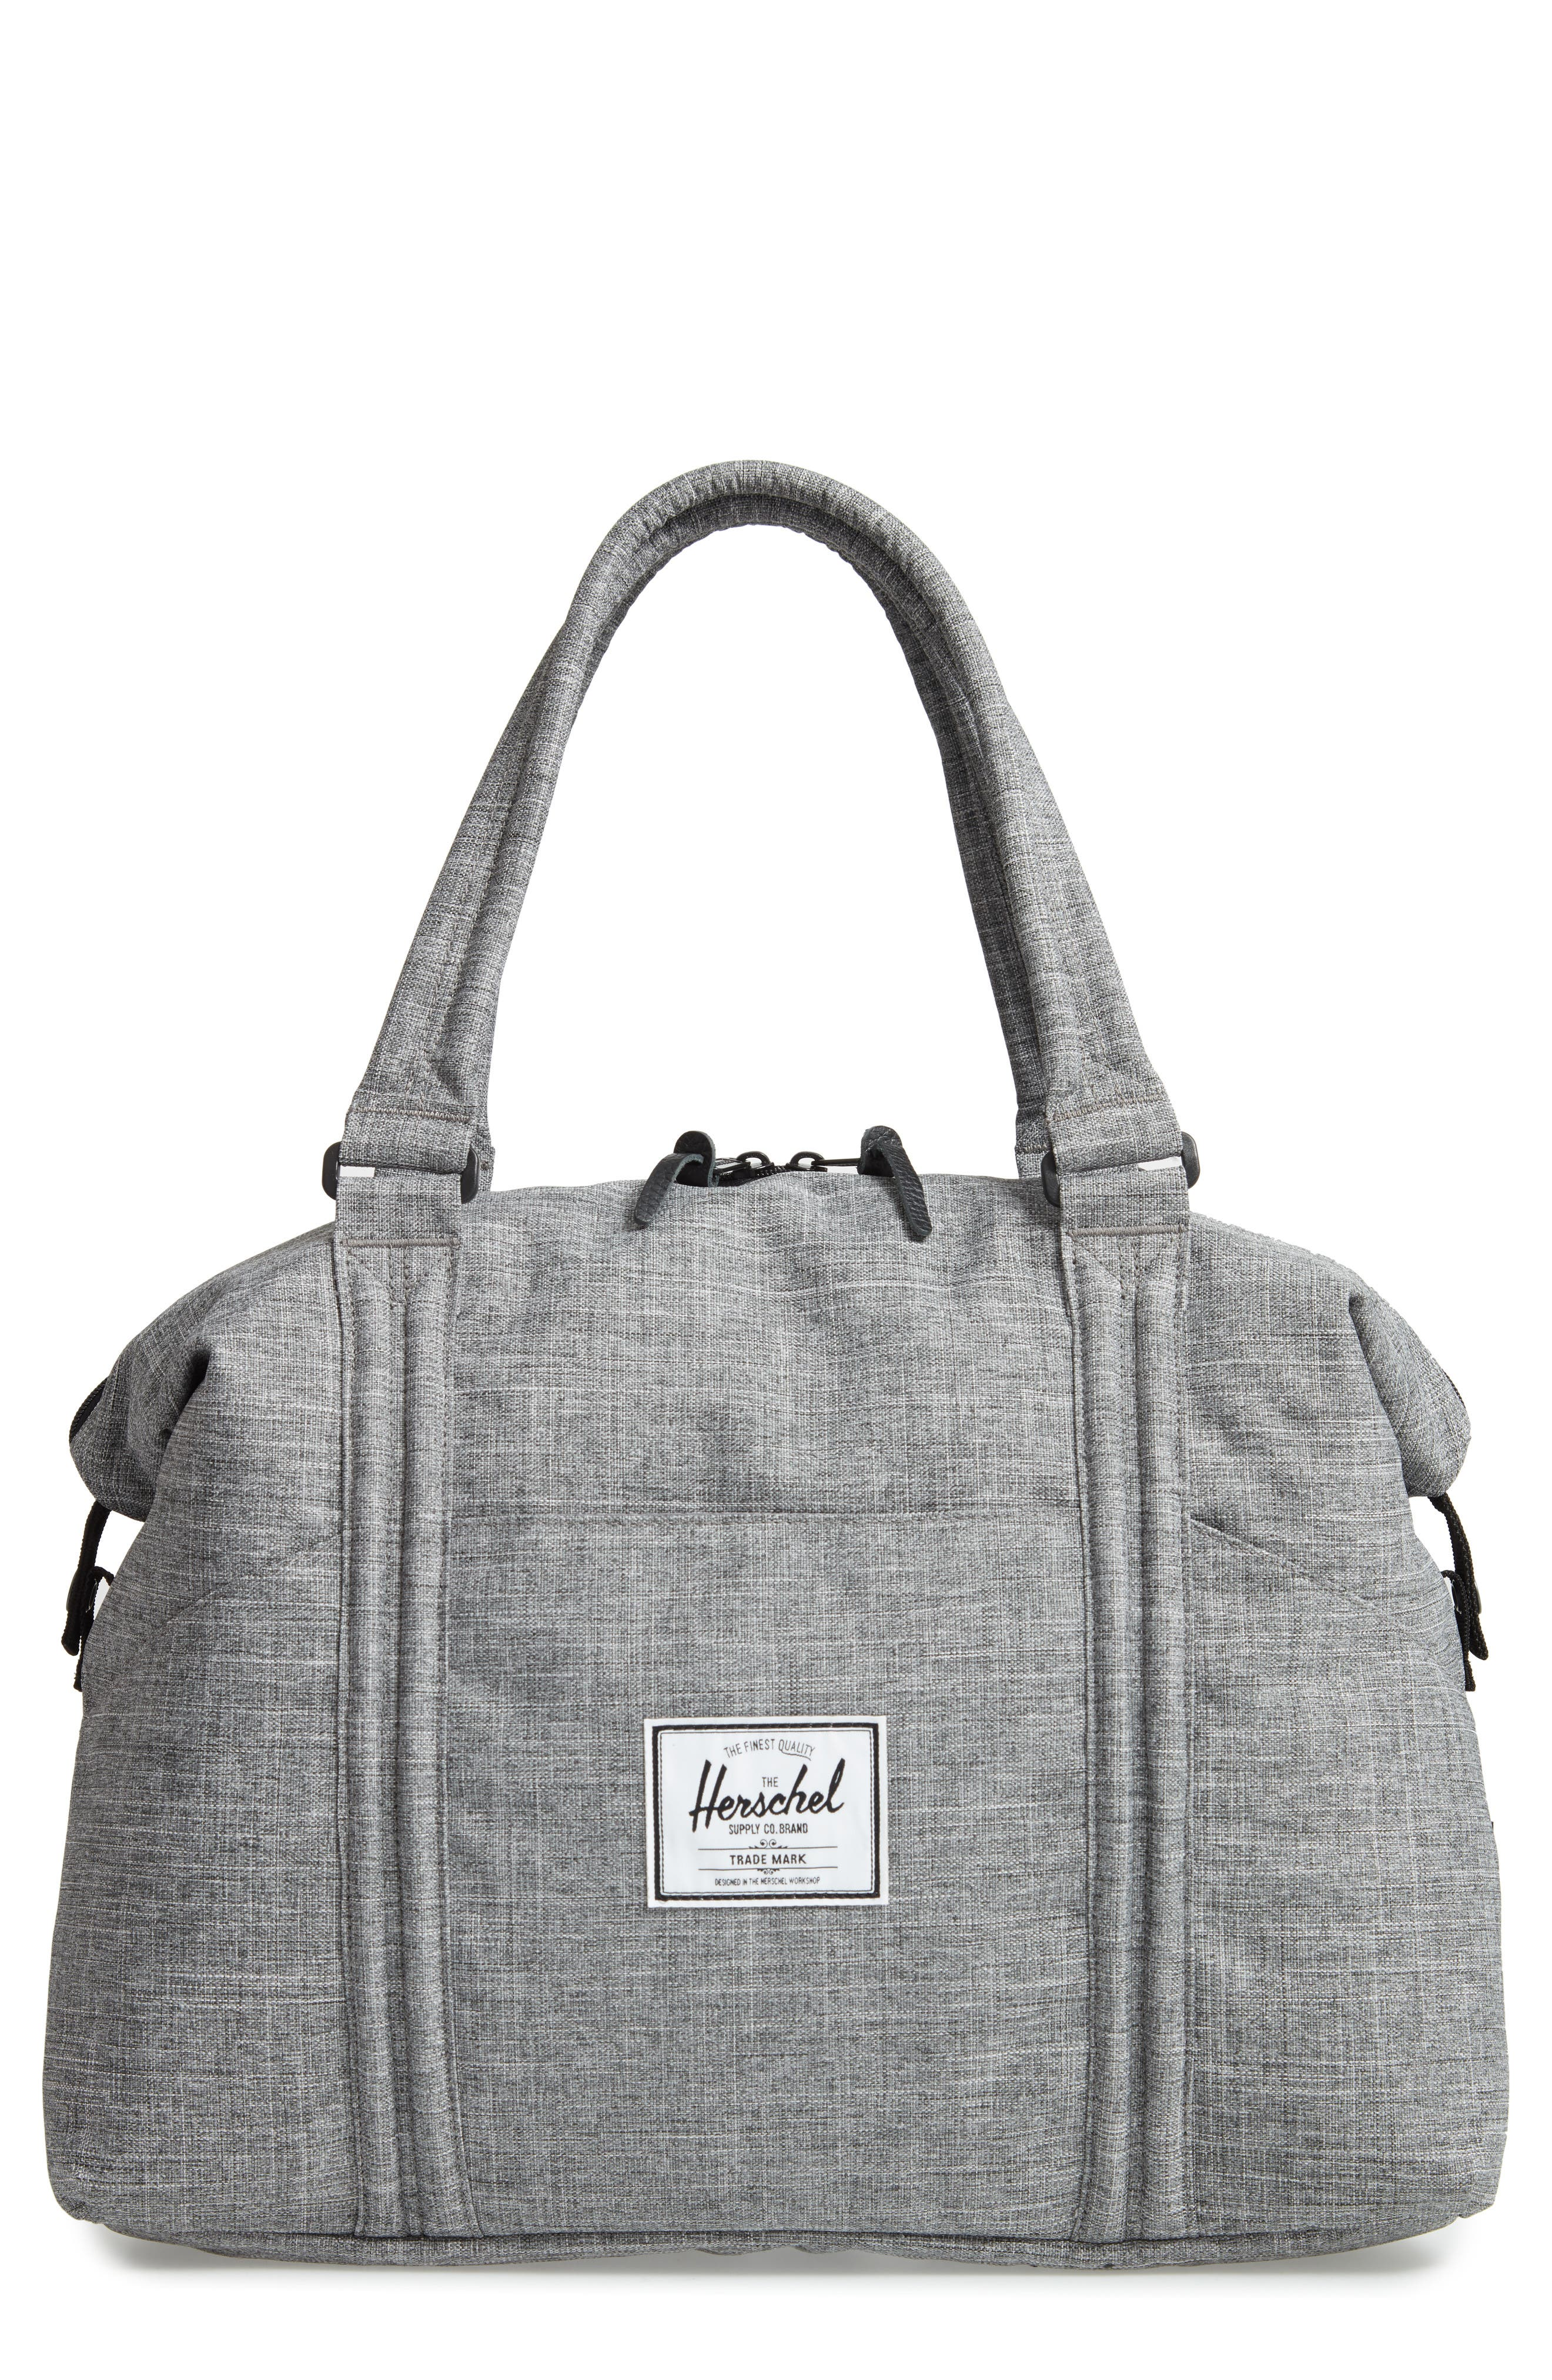 Strand Duffel Bag,                             Main thumbnail 1, color,                             074